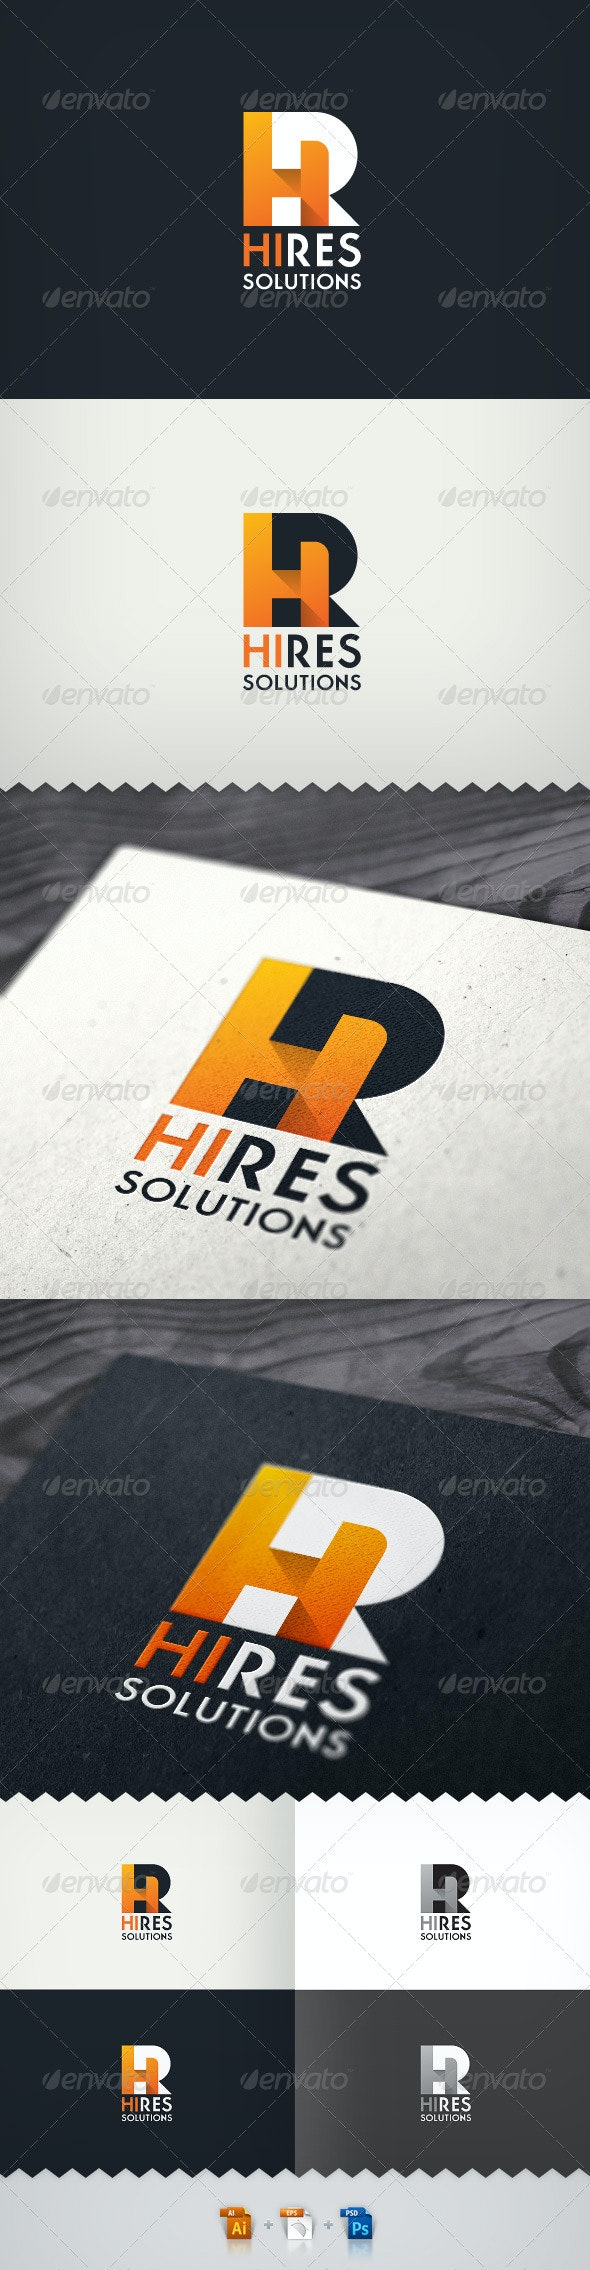 Hi-Res Solutions Render Farm Logo - Letters Logo Templates